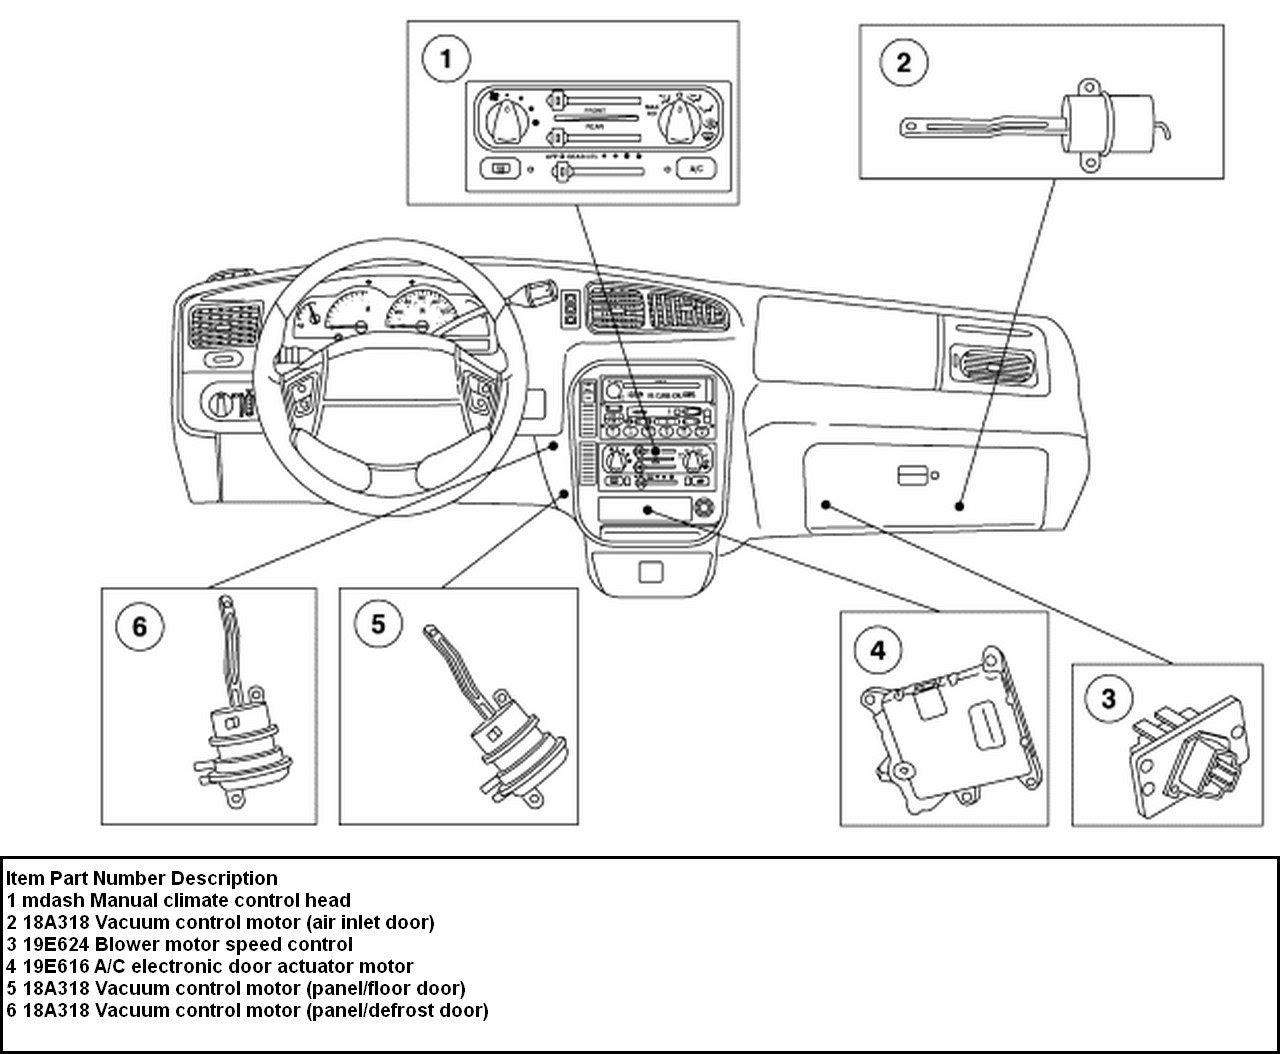 2004 F150 Blend Door Diagram Wiring Schematic Full Hd Version Wiring Schematic Value Stream Map Emballages Sous Vide Fr